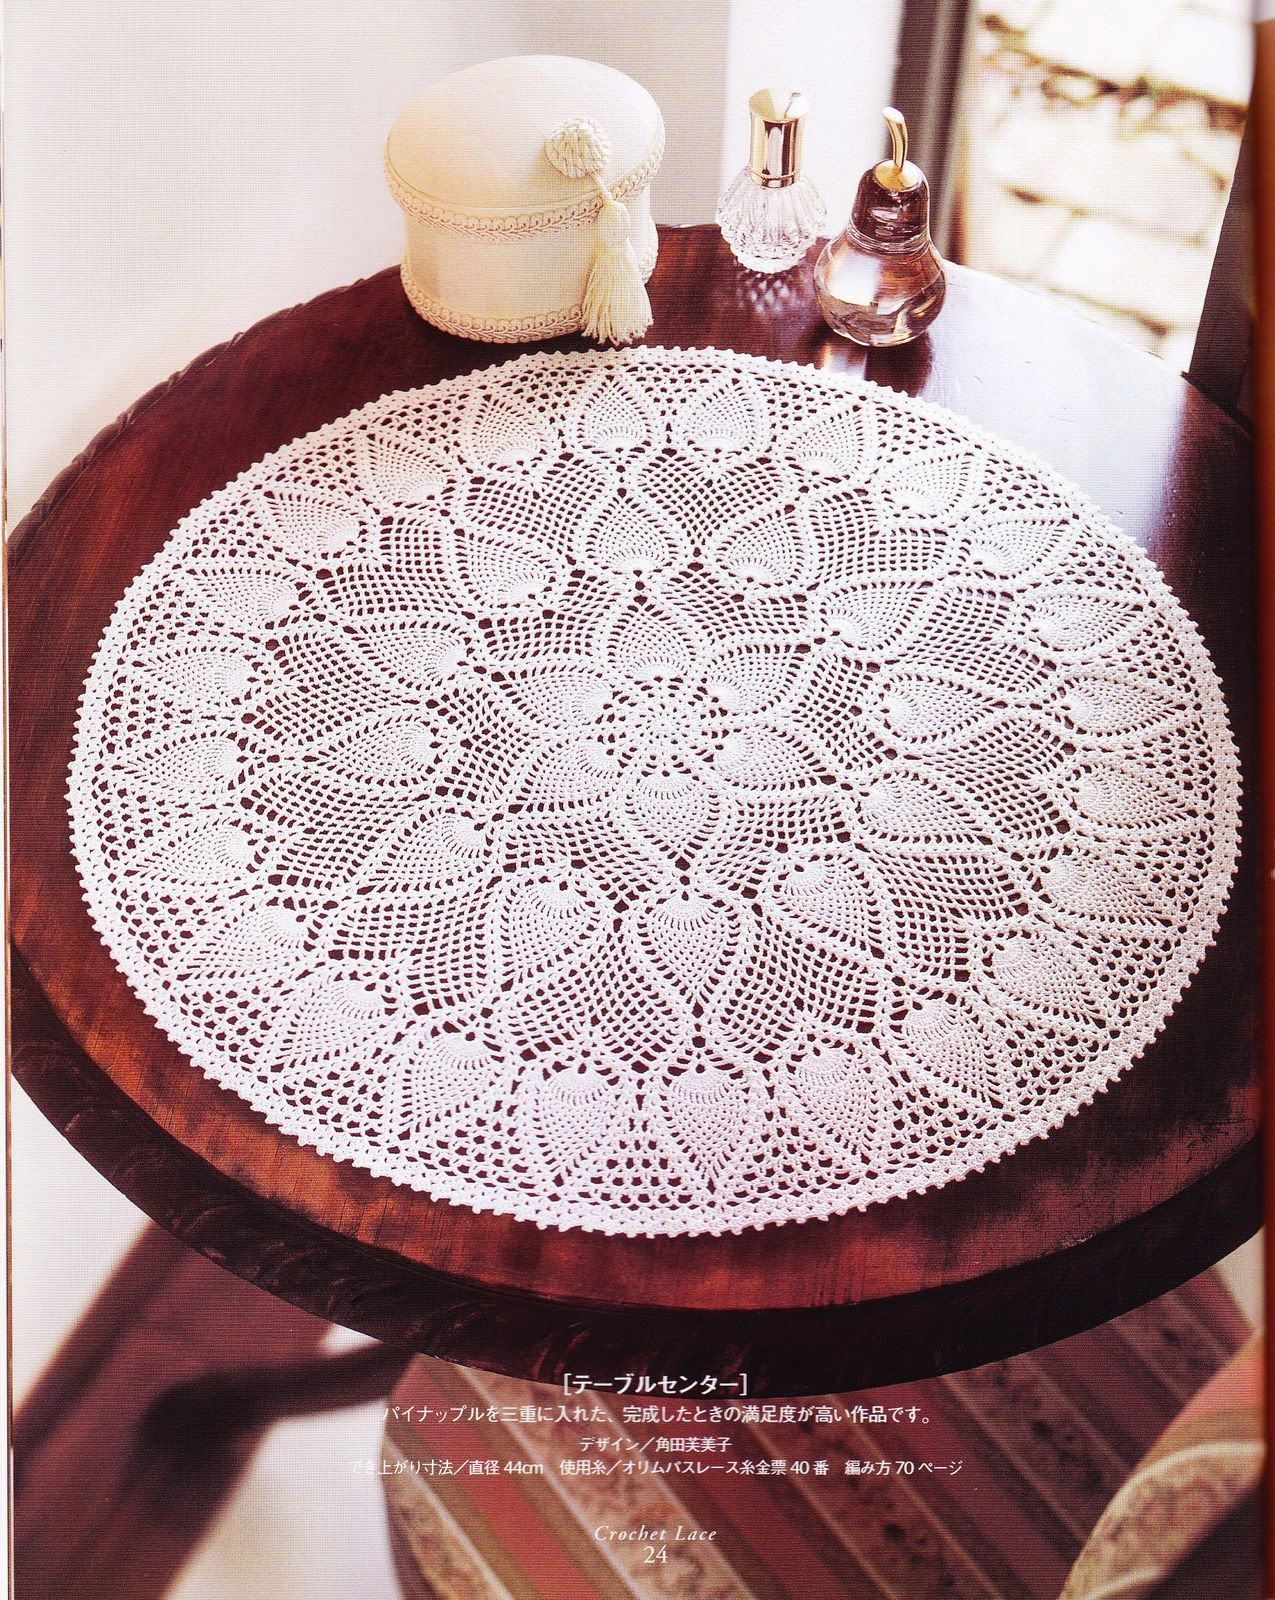 PATRONES GRATIS DE CROCHET: Carpeta | paños a crochet | Pinterest ...